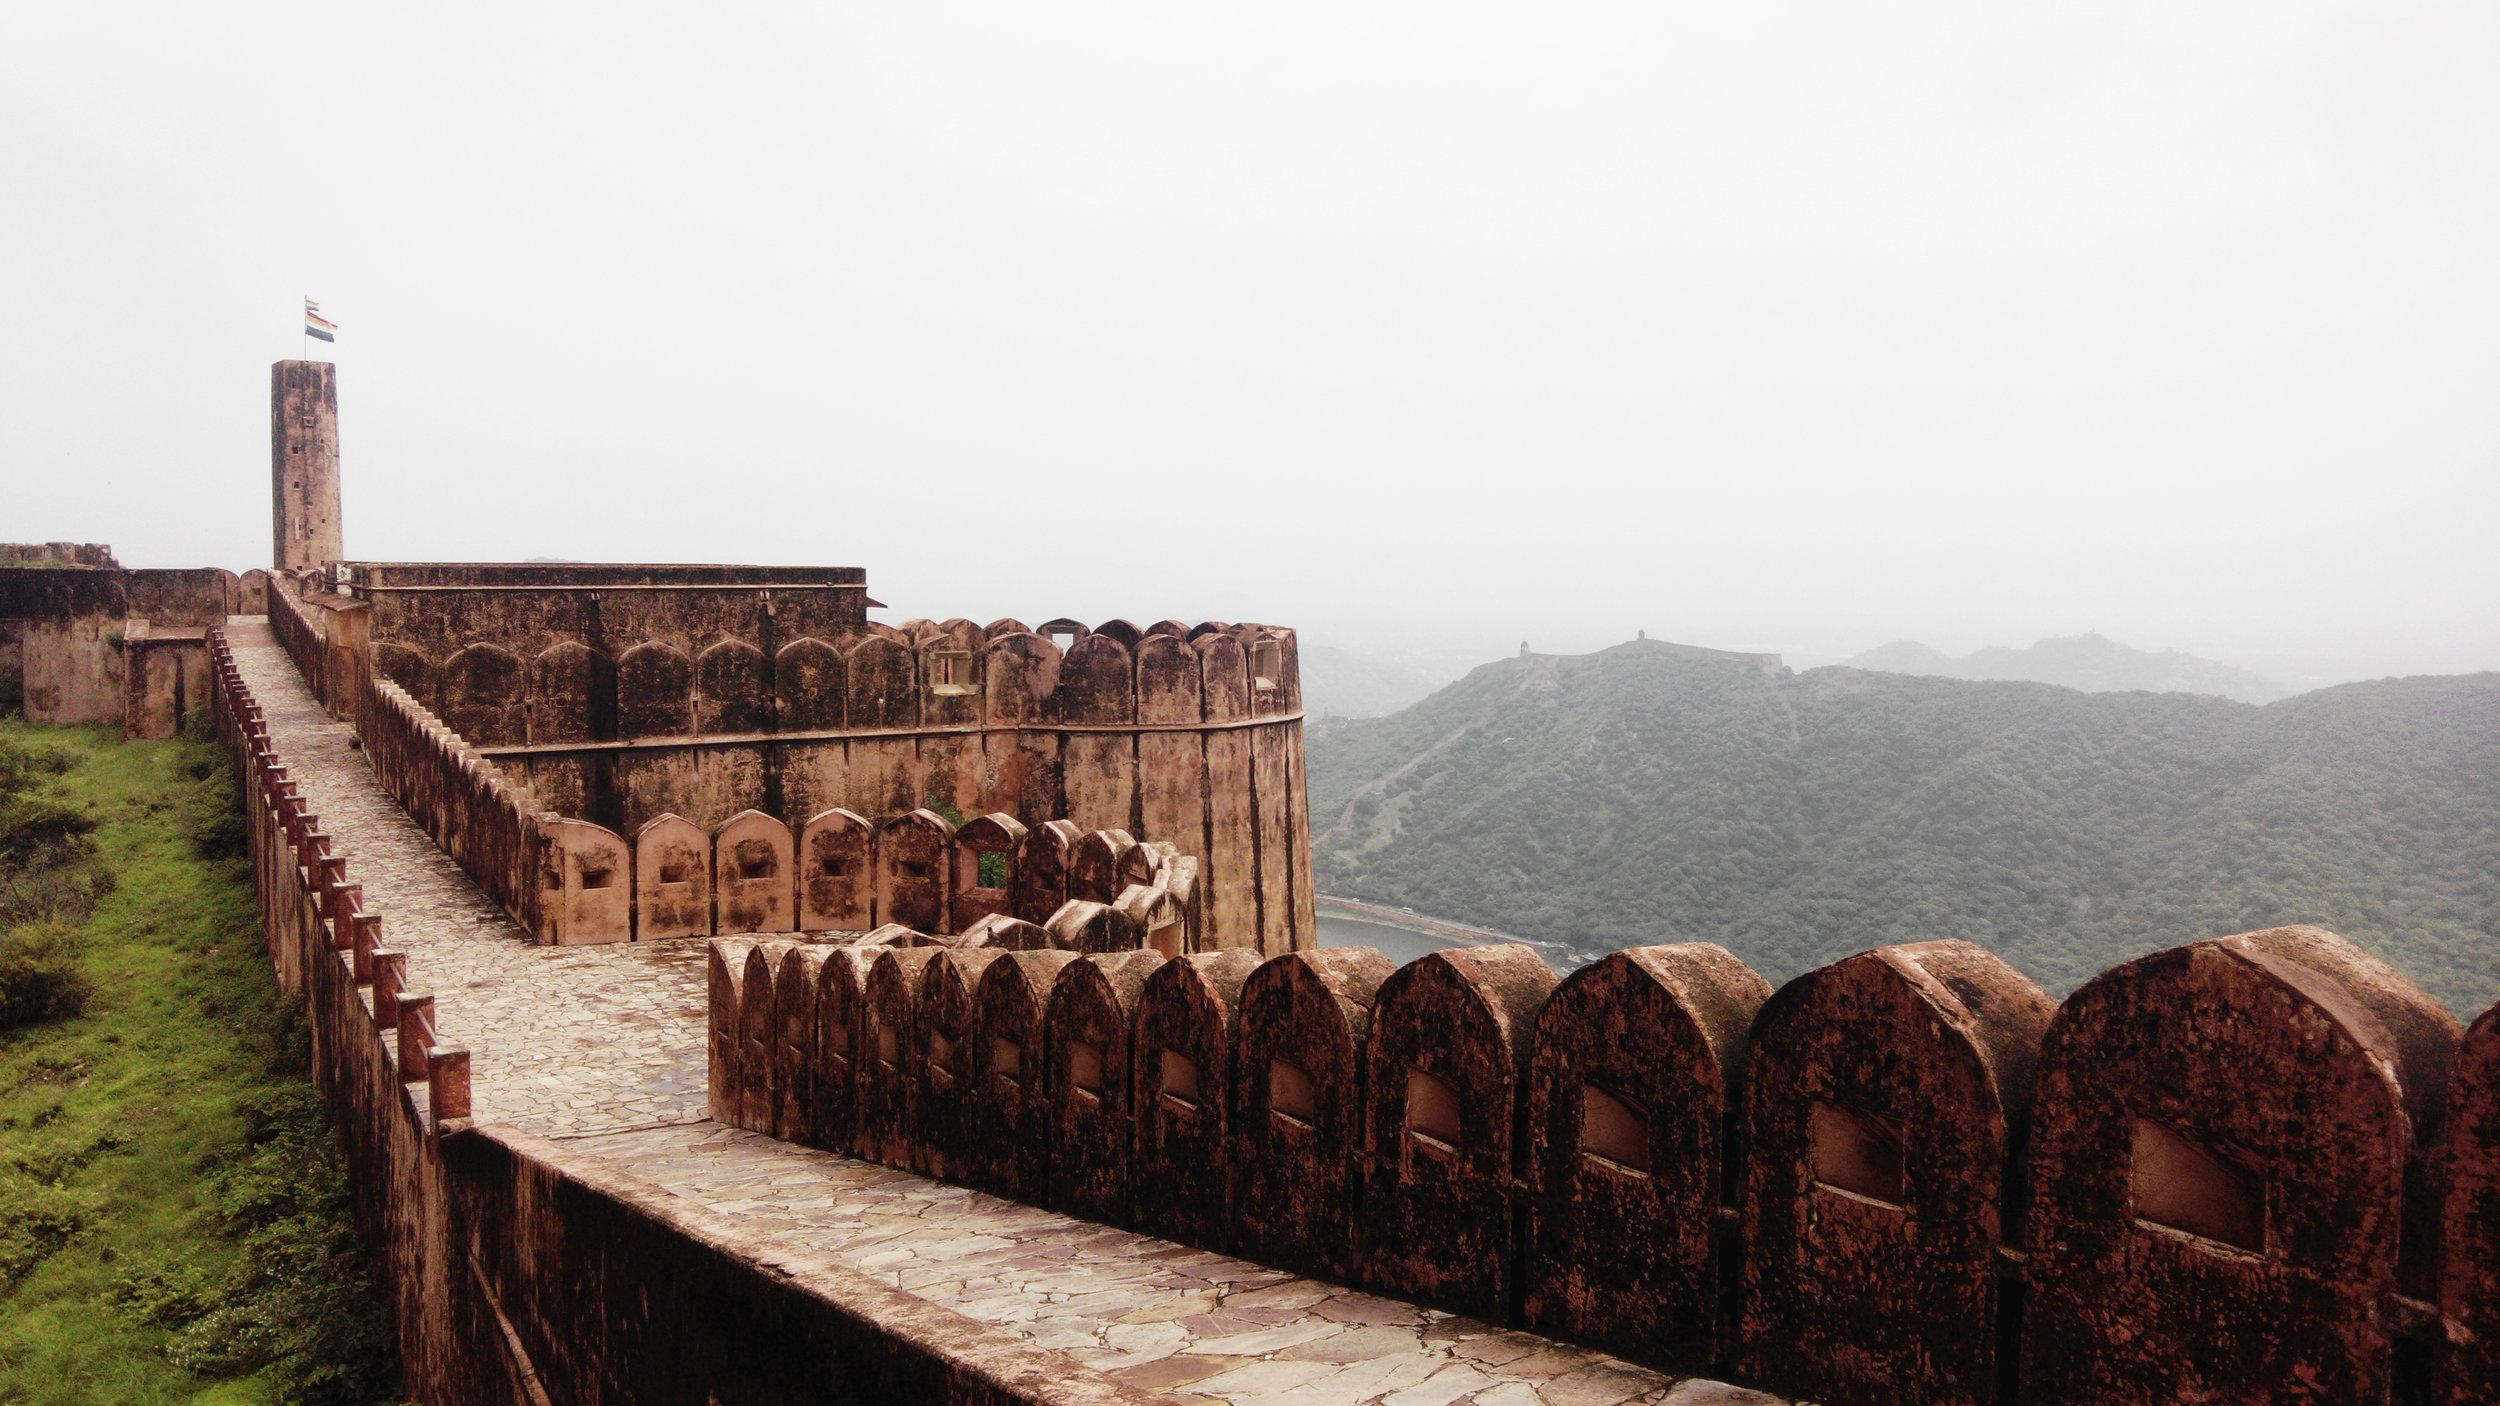 jaipur-fort-walls.jpg